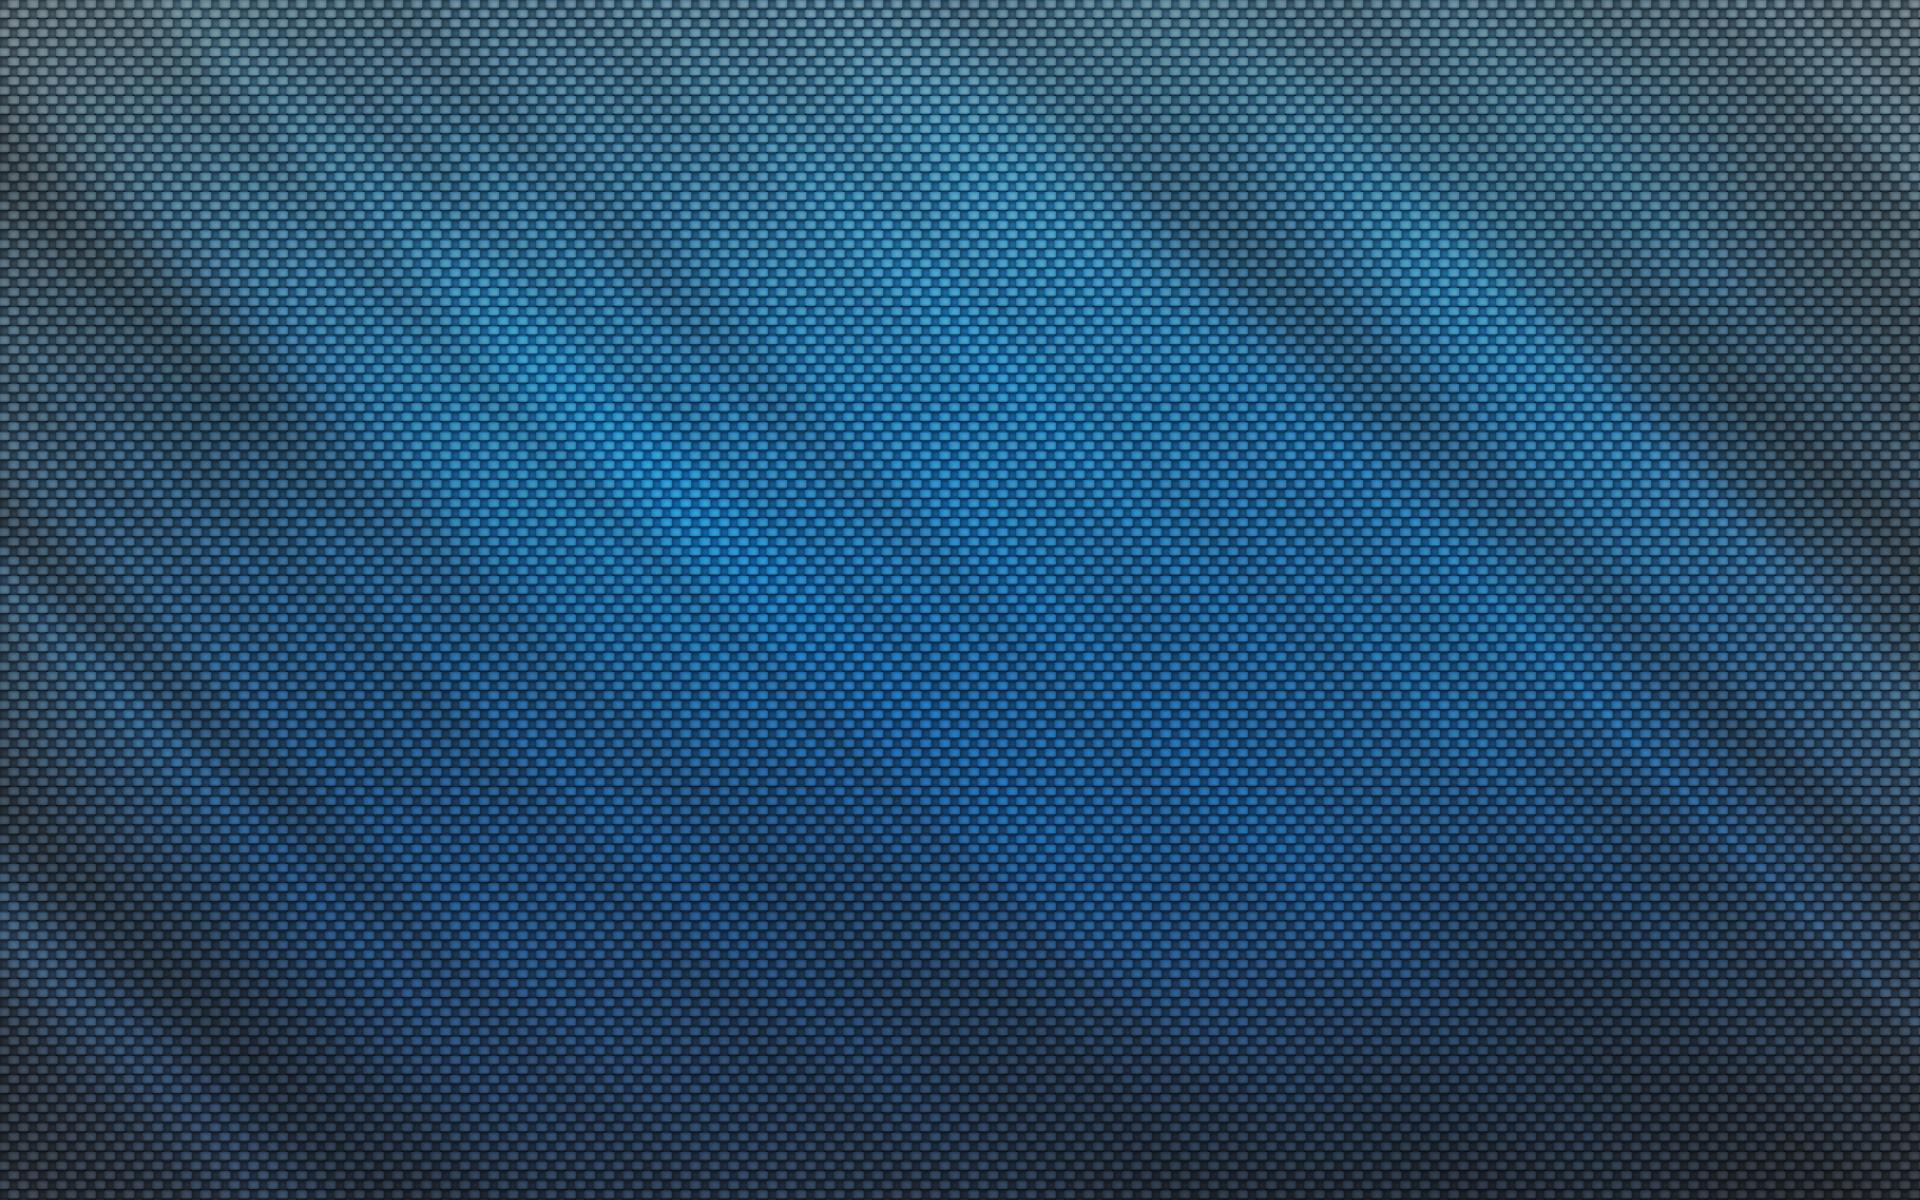 Image: carbon_fiber_reflection___blue_by_slc_world-d5nc1a4.png]